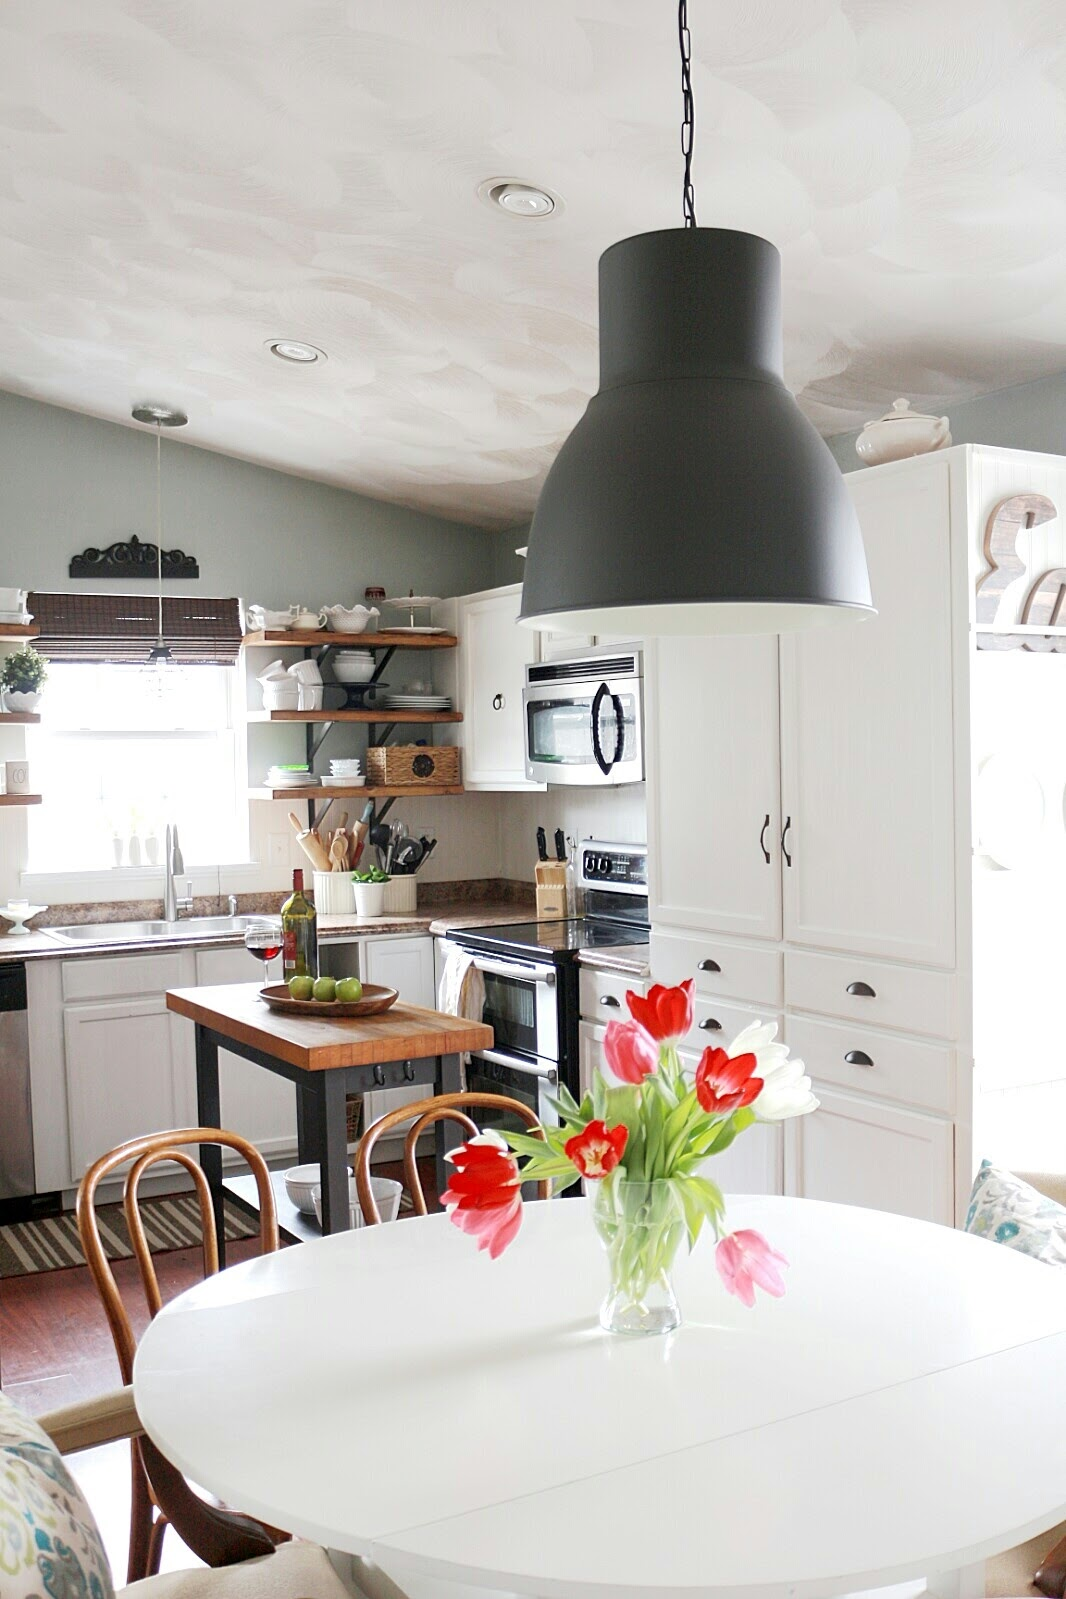 New Dining Room Lighting, Ikea Hektar Pendant - Made by Carli